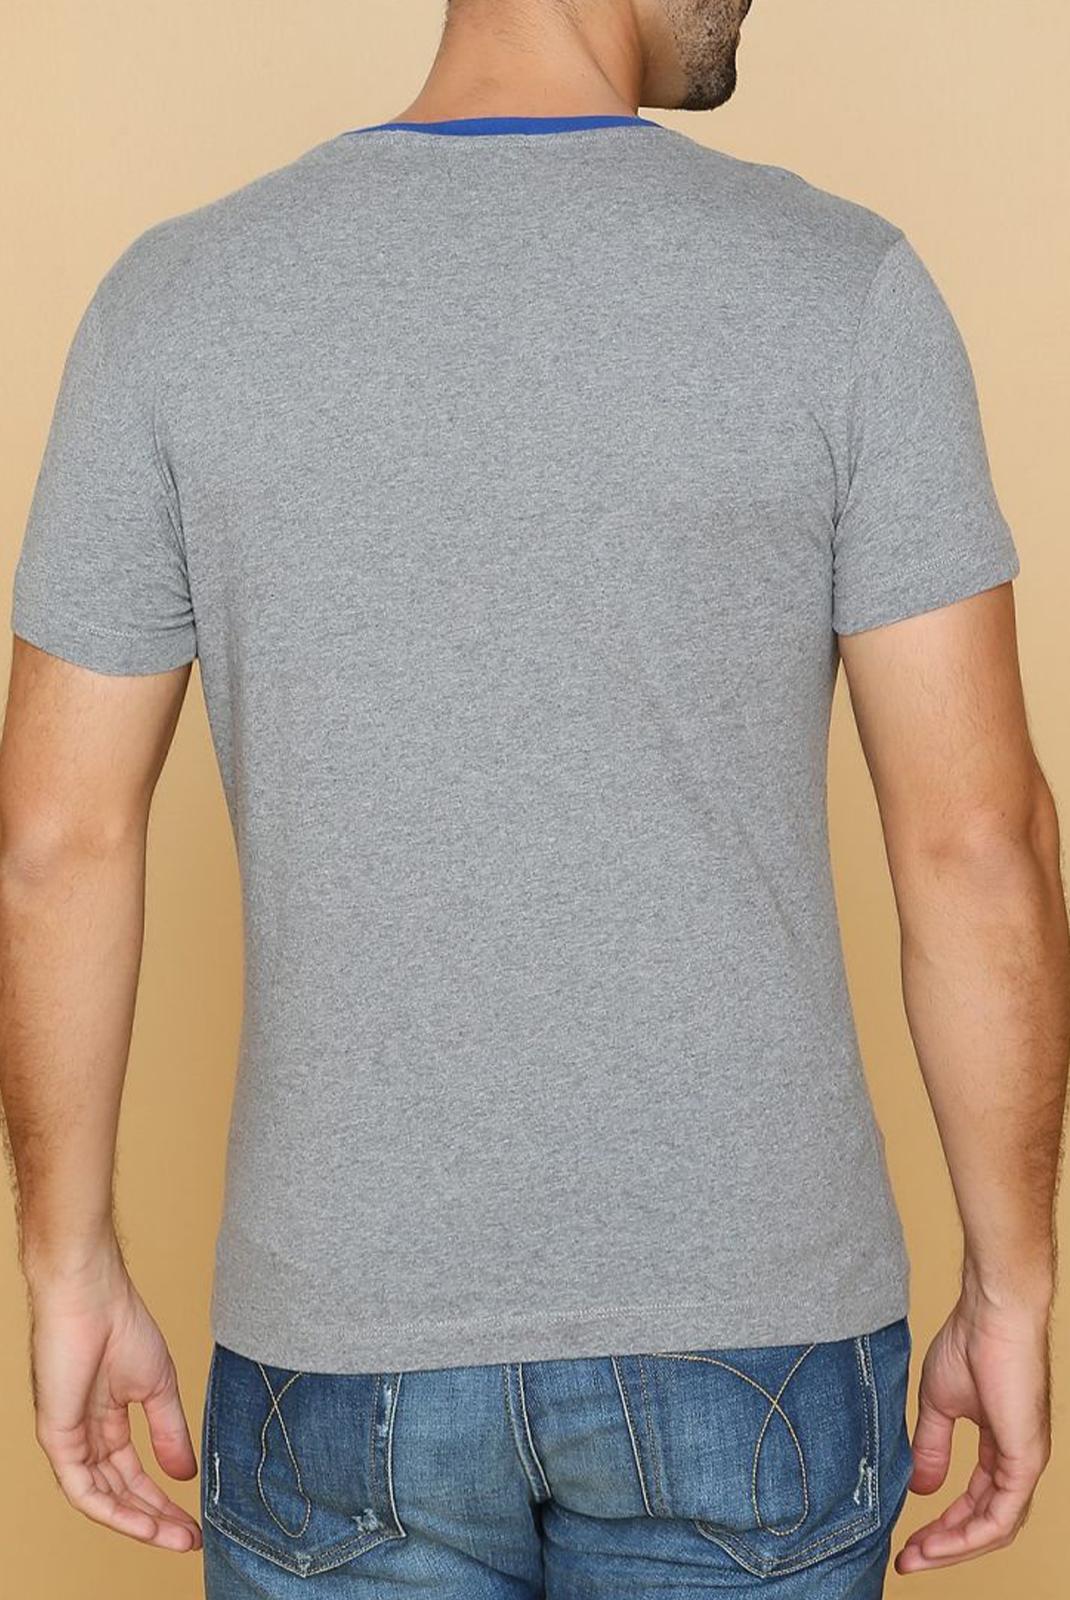 Tee-shirts  Calvin klein J30J313242 039 GRIS